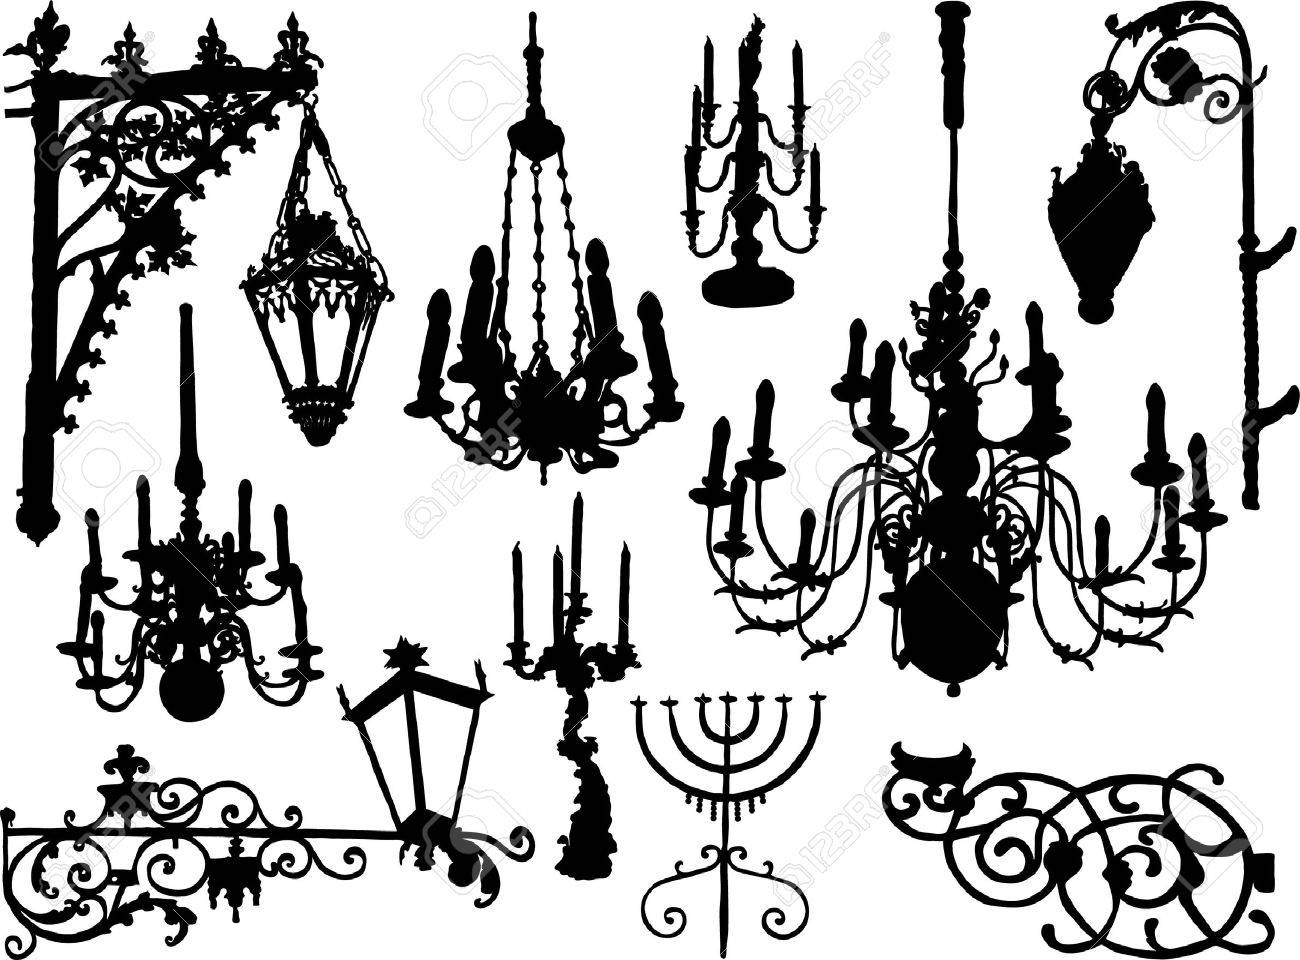 Vector baroque chandeliers and lamps - 3283659